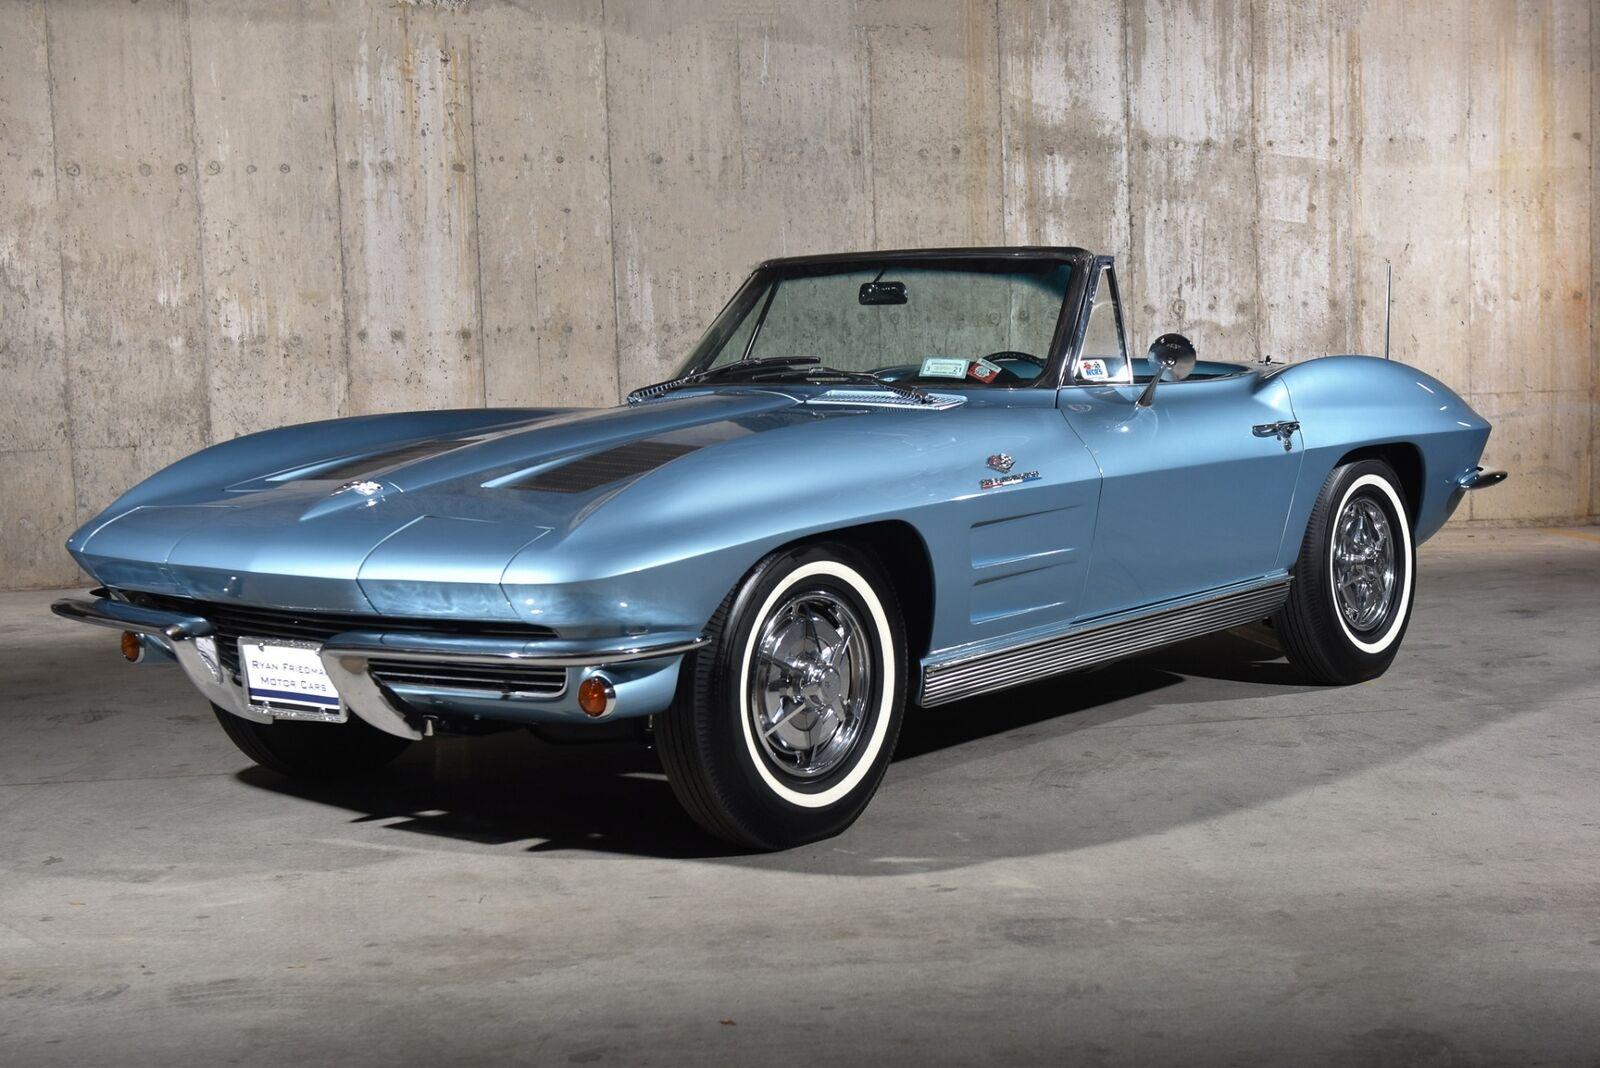 1963 Blue Chevrolet Corvette   | C2 Corvette Photo 3